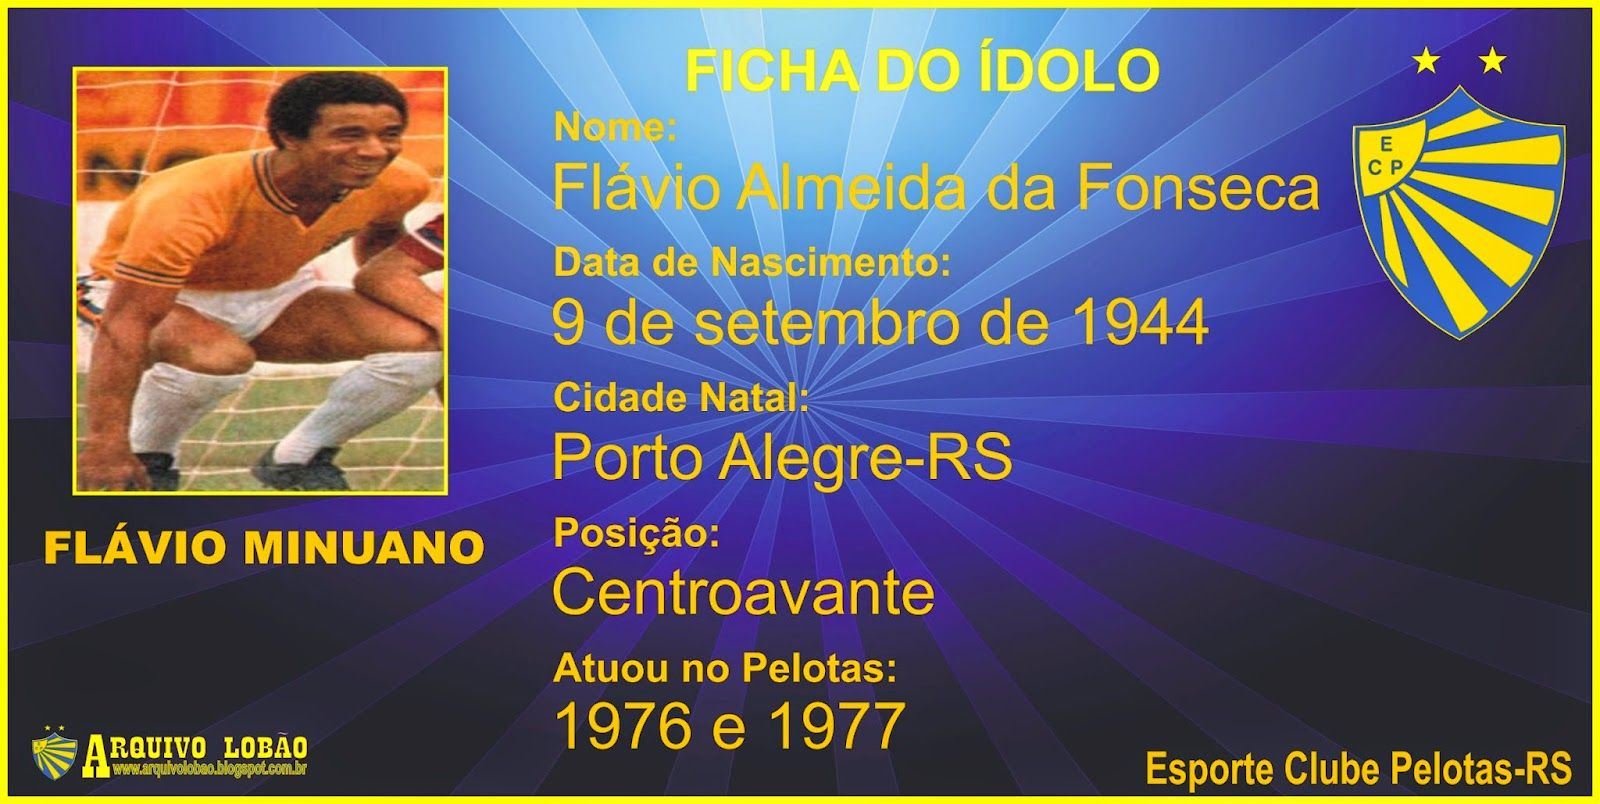 Flavio Minuano Idolo Da Torcida Clube Paulo Baier Celso